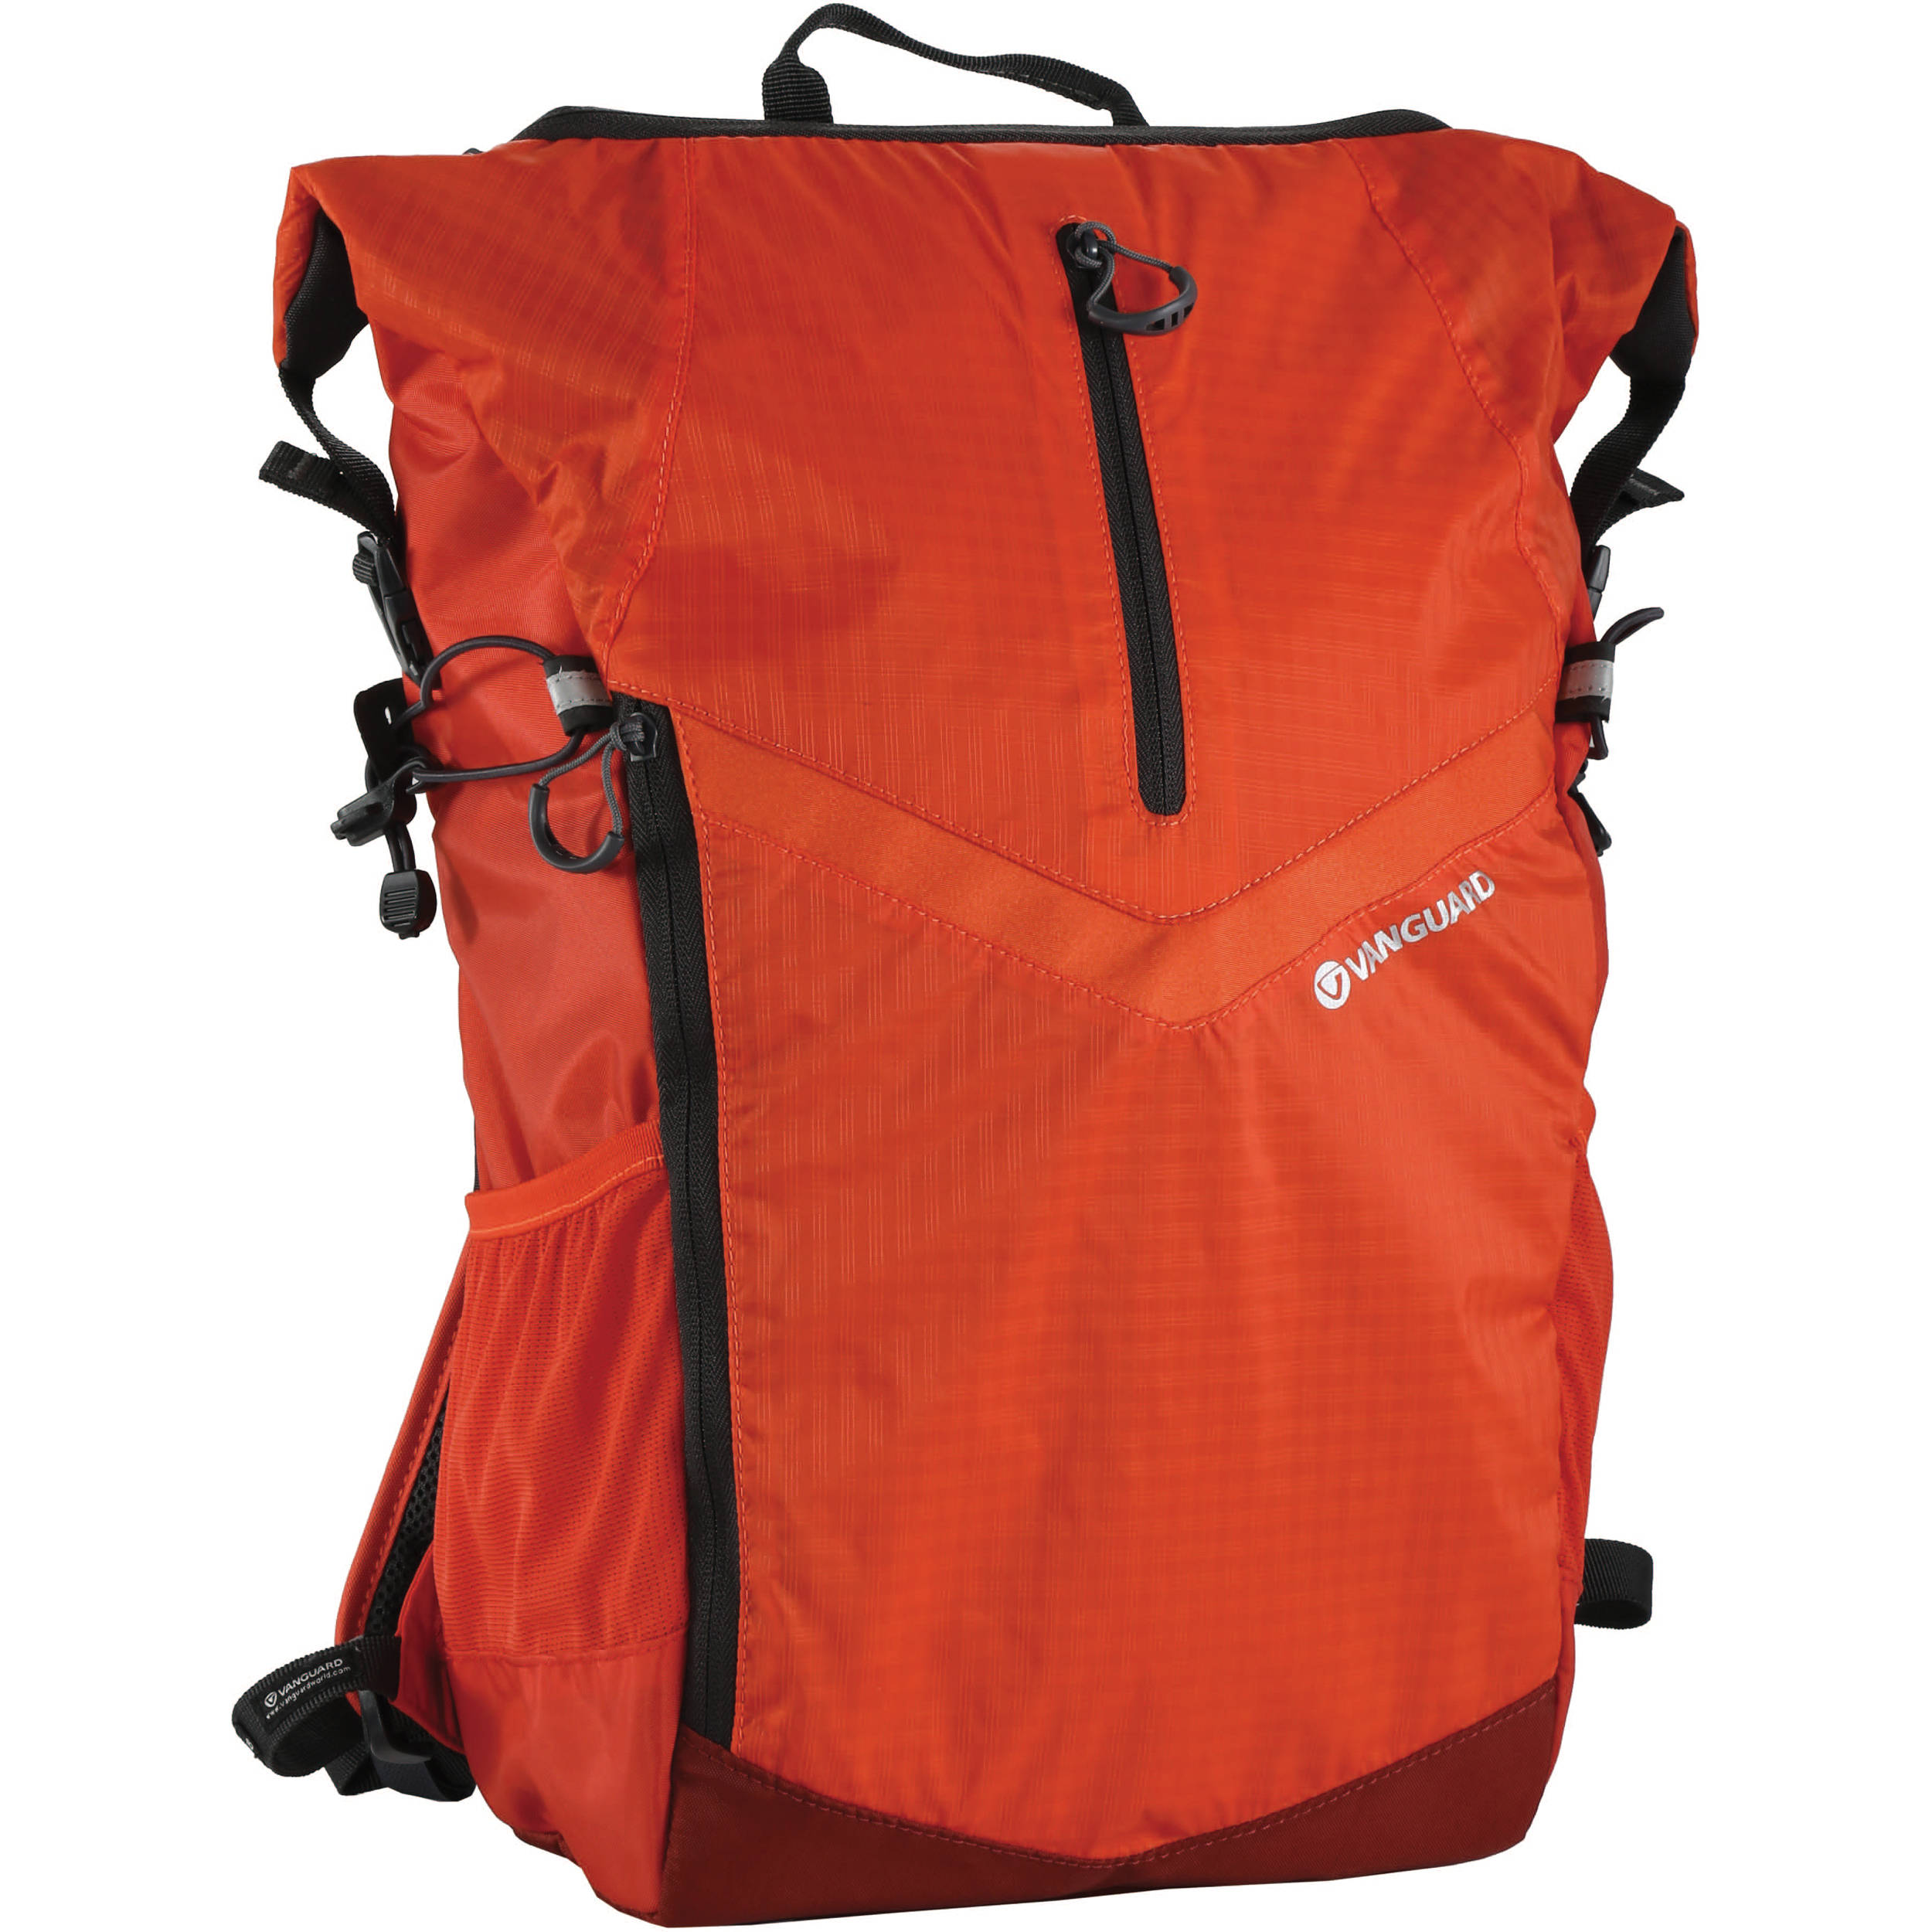 Vanguard Reno 48 DSLR Backpack (Orange) RENO 48OR B&H Photo